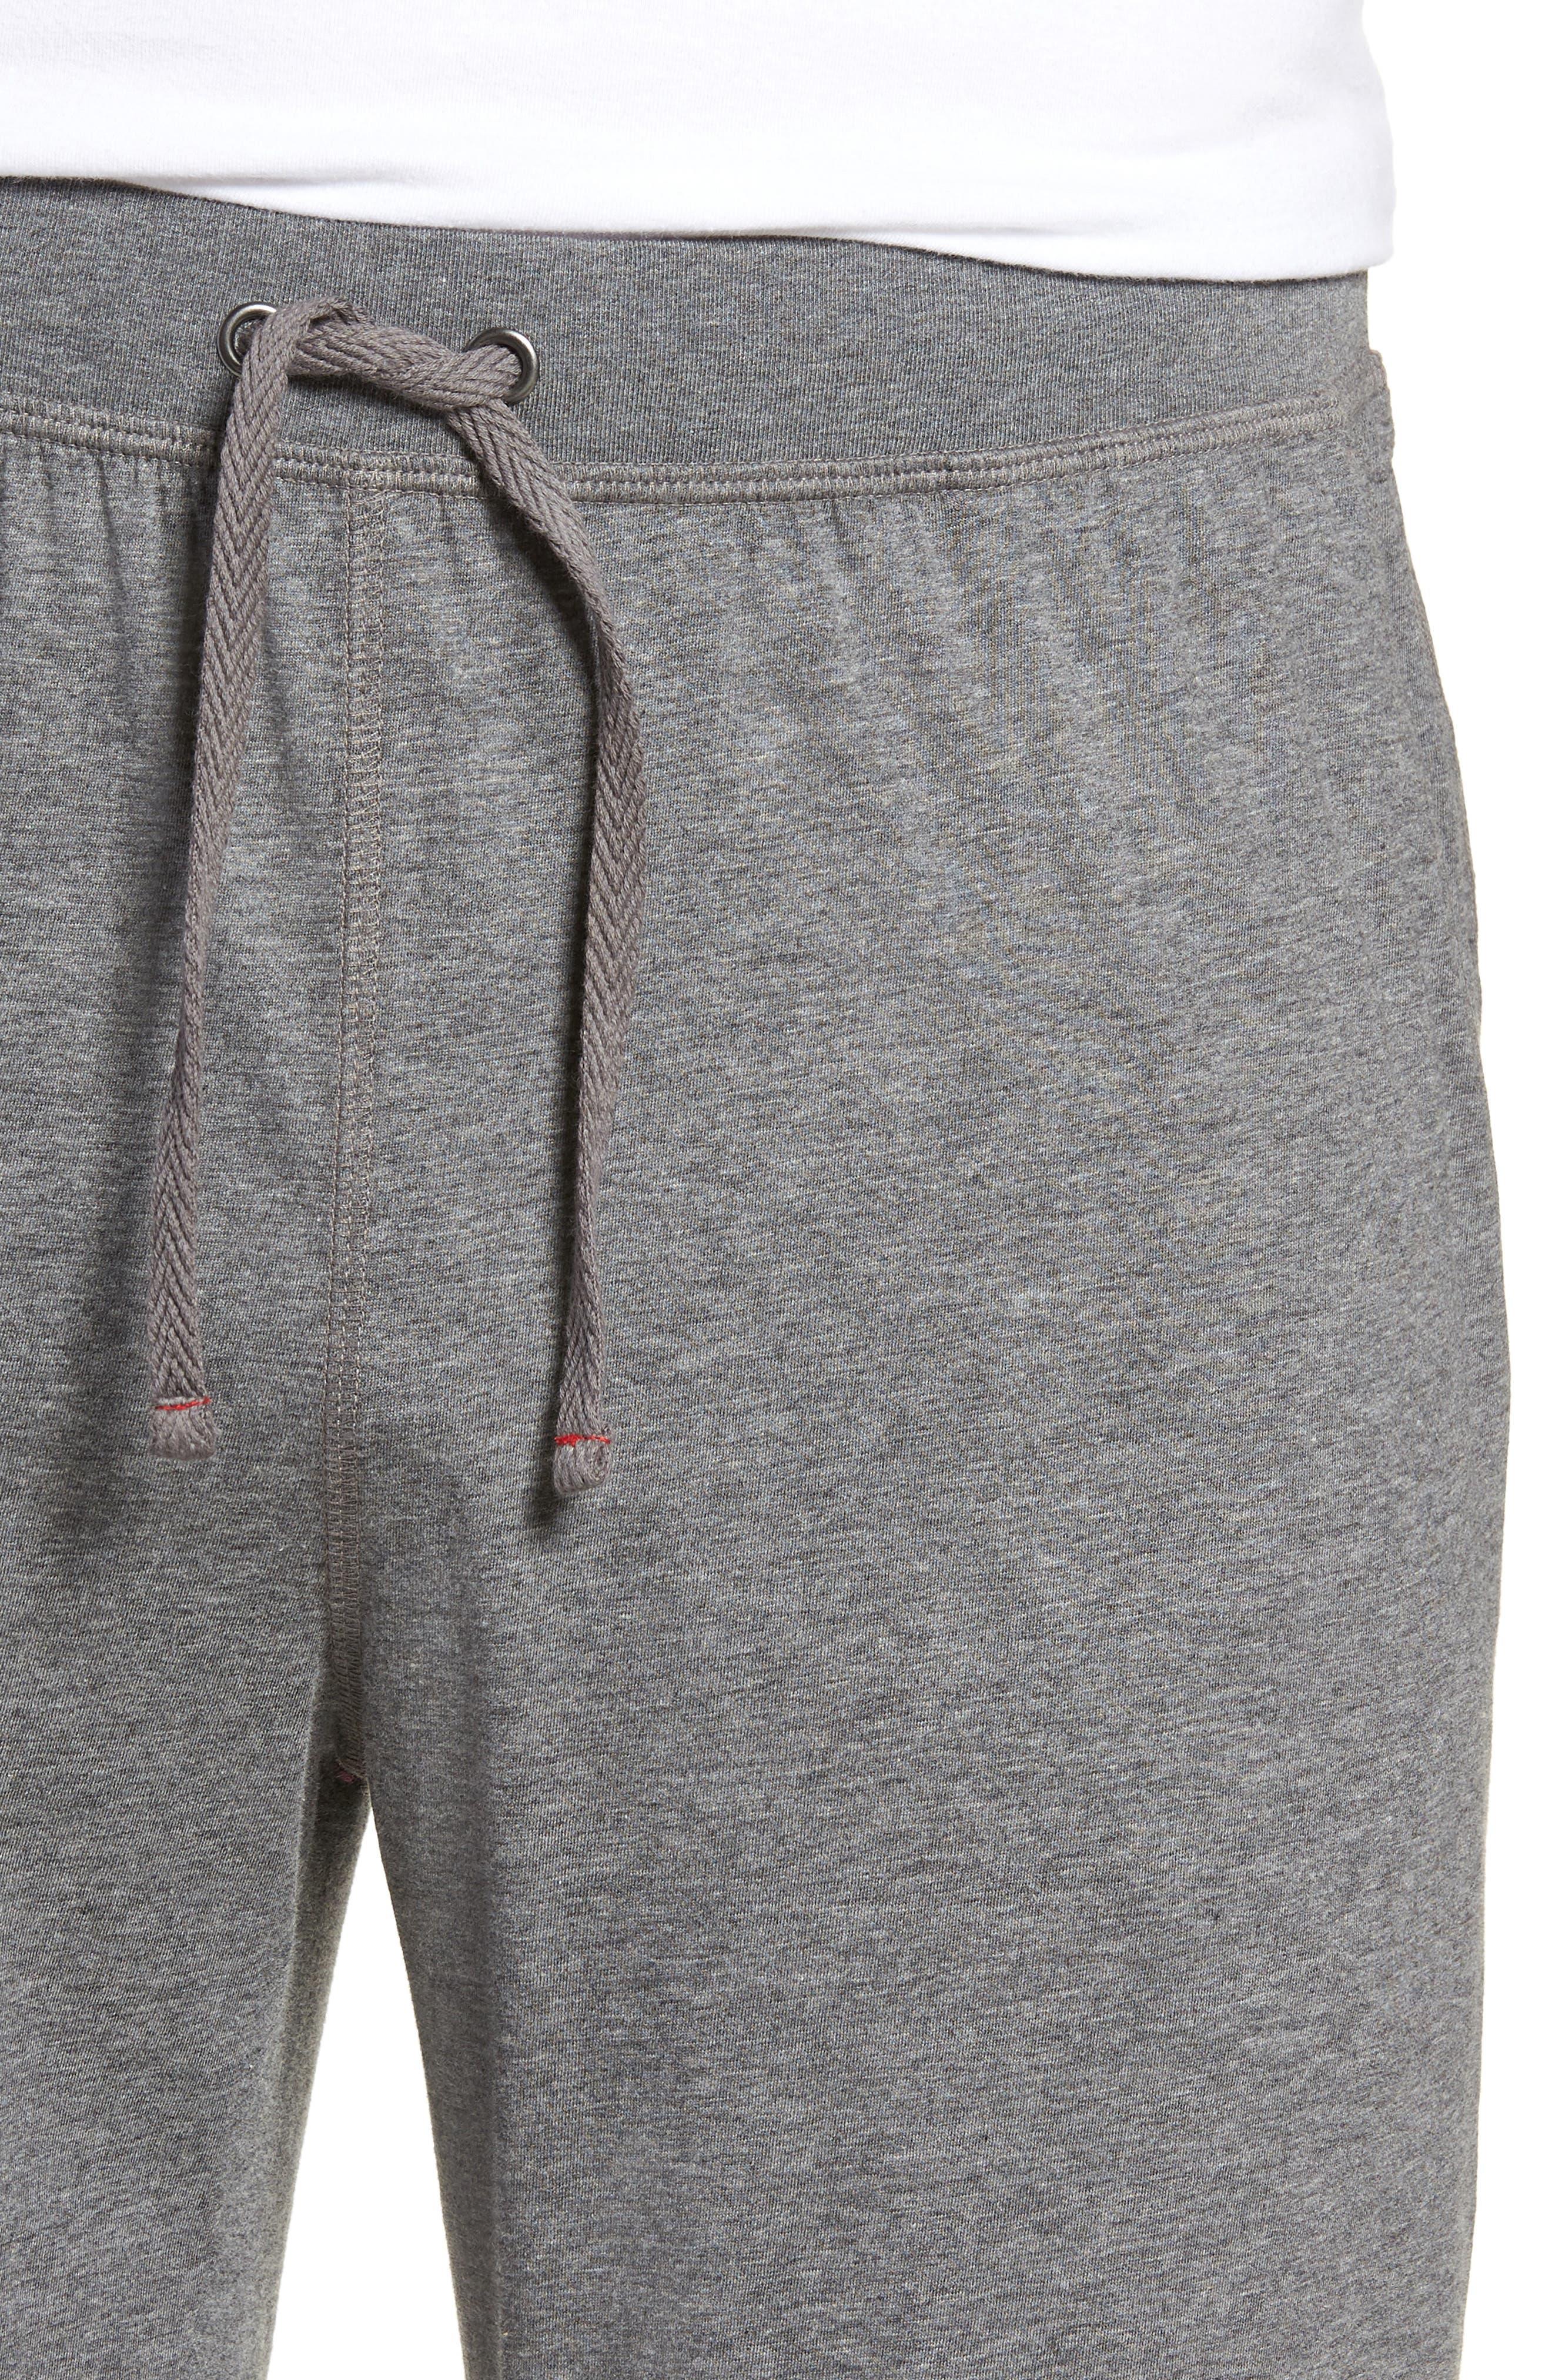 Peruvian Pima Lightweight Cotton Lounge Pants,                             Alternate thumbnail 4, color,                             CHARCOAL HEATHER